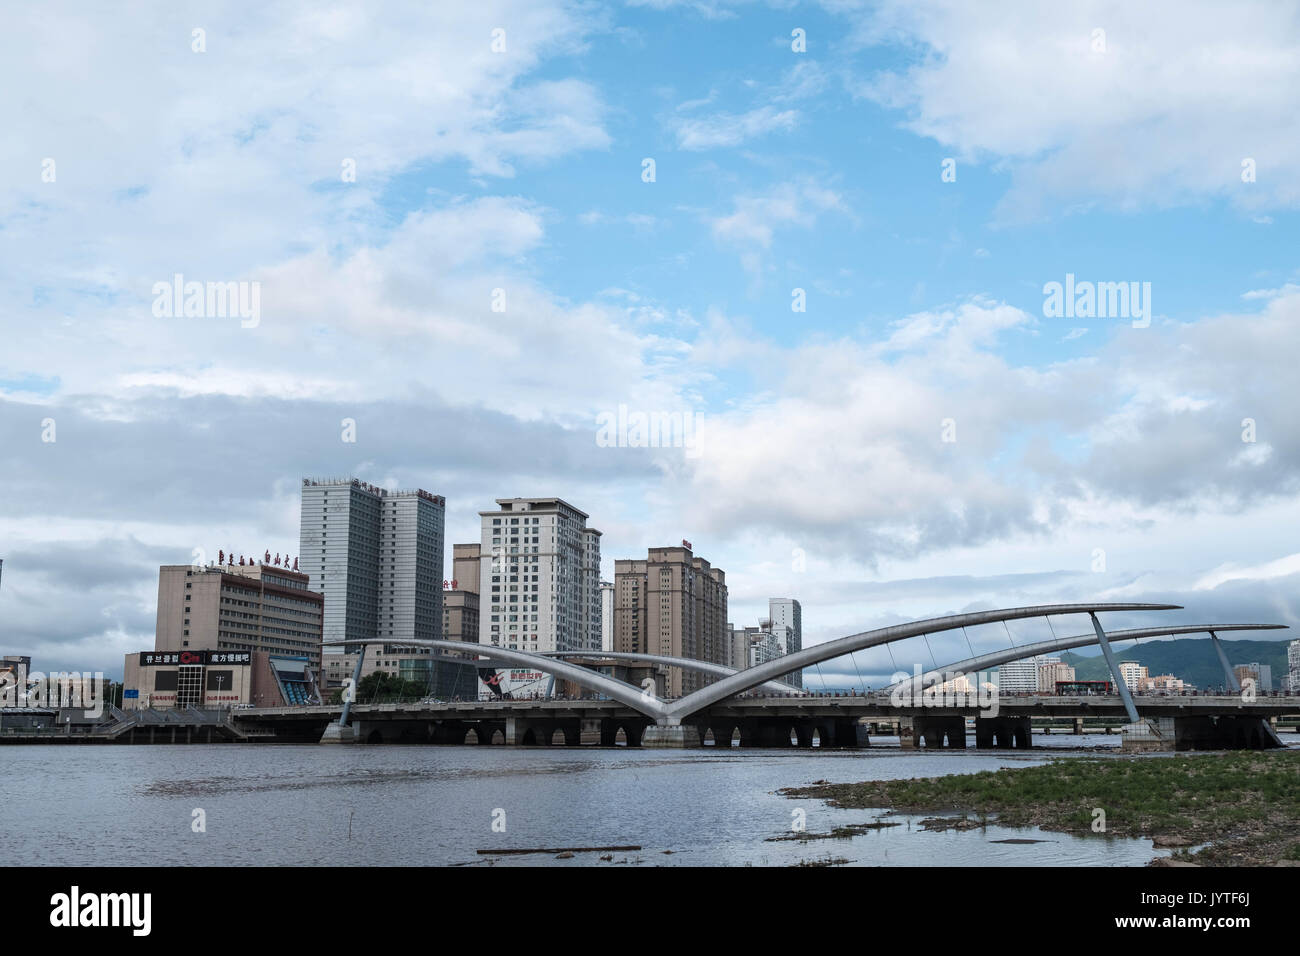 Yanji, China – August 8, 2017: Yanji is the seat of the